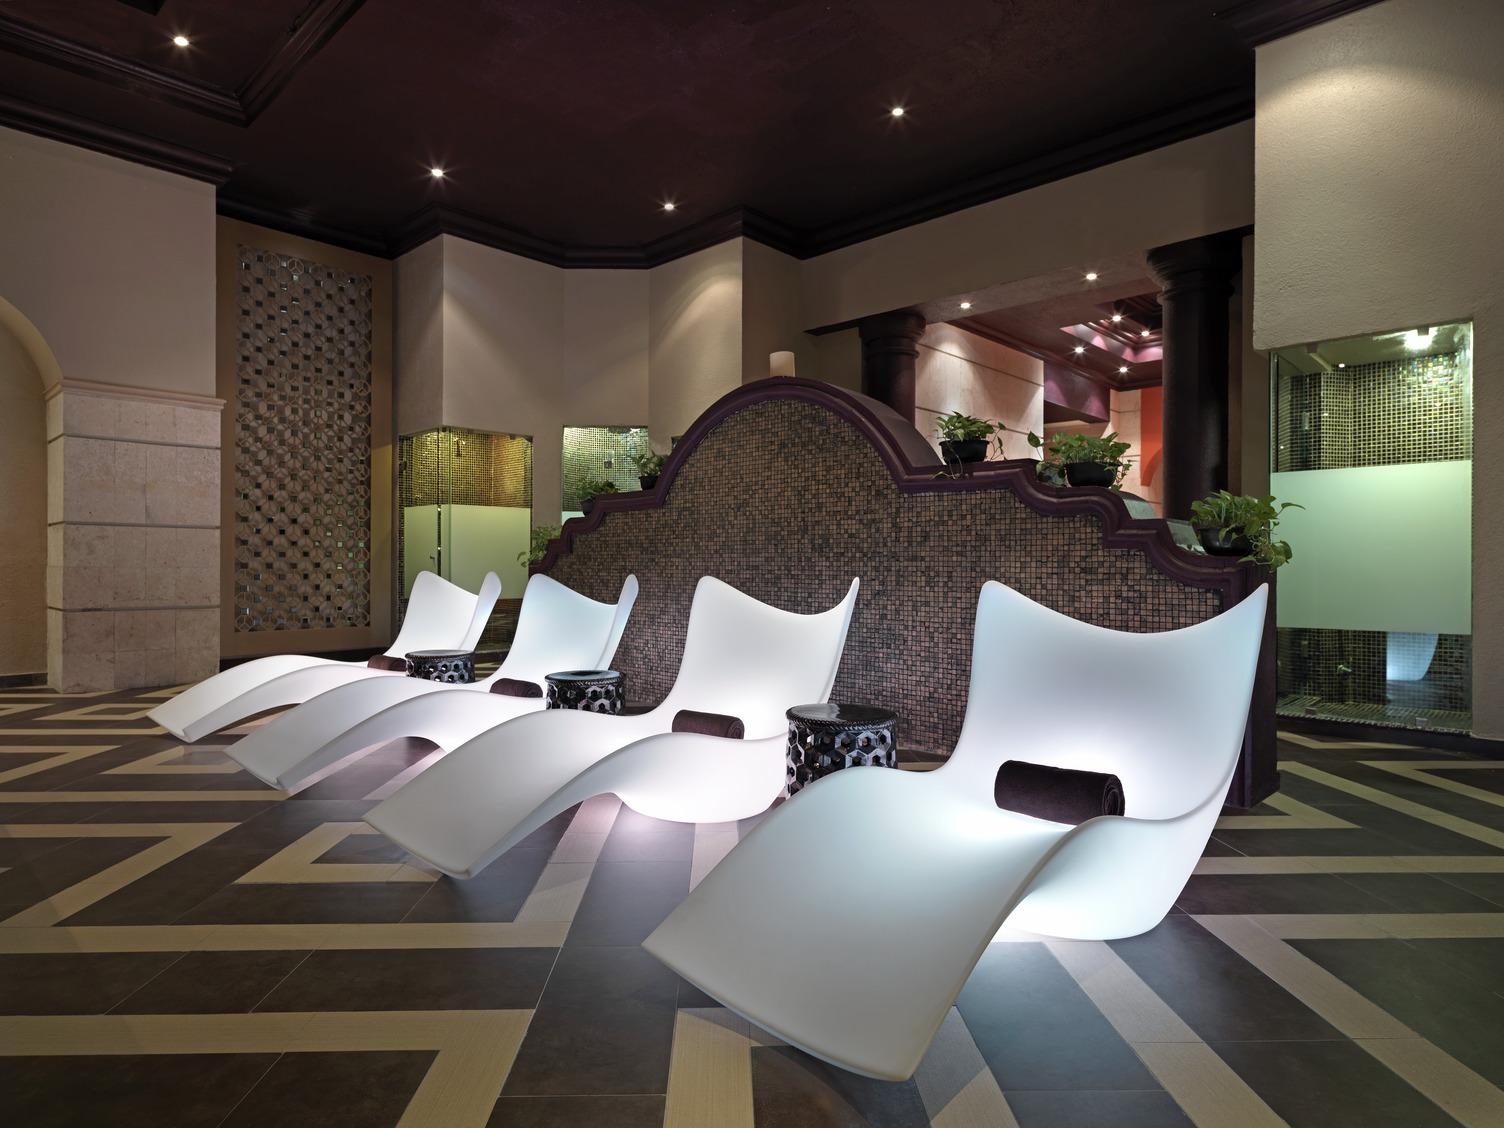 Travel Agency All-Inclusive Resort Heaven at Hard Rock Hotel Riviera Maya 61